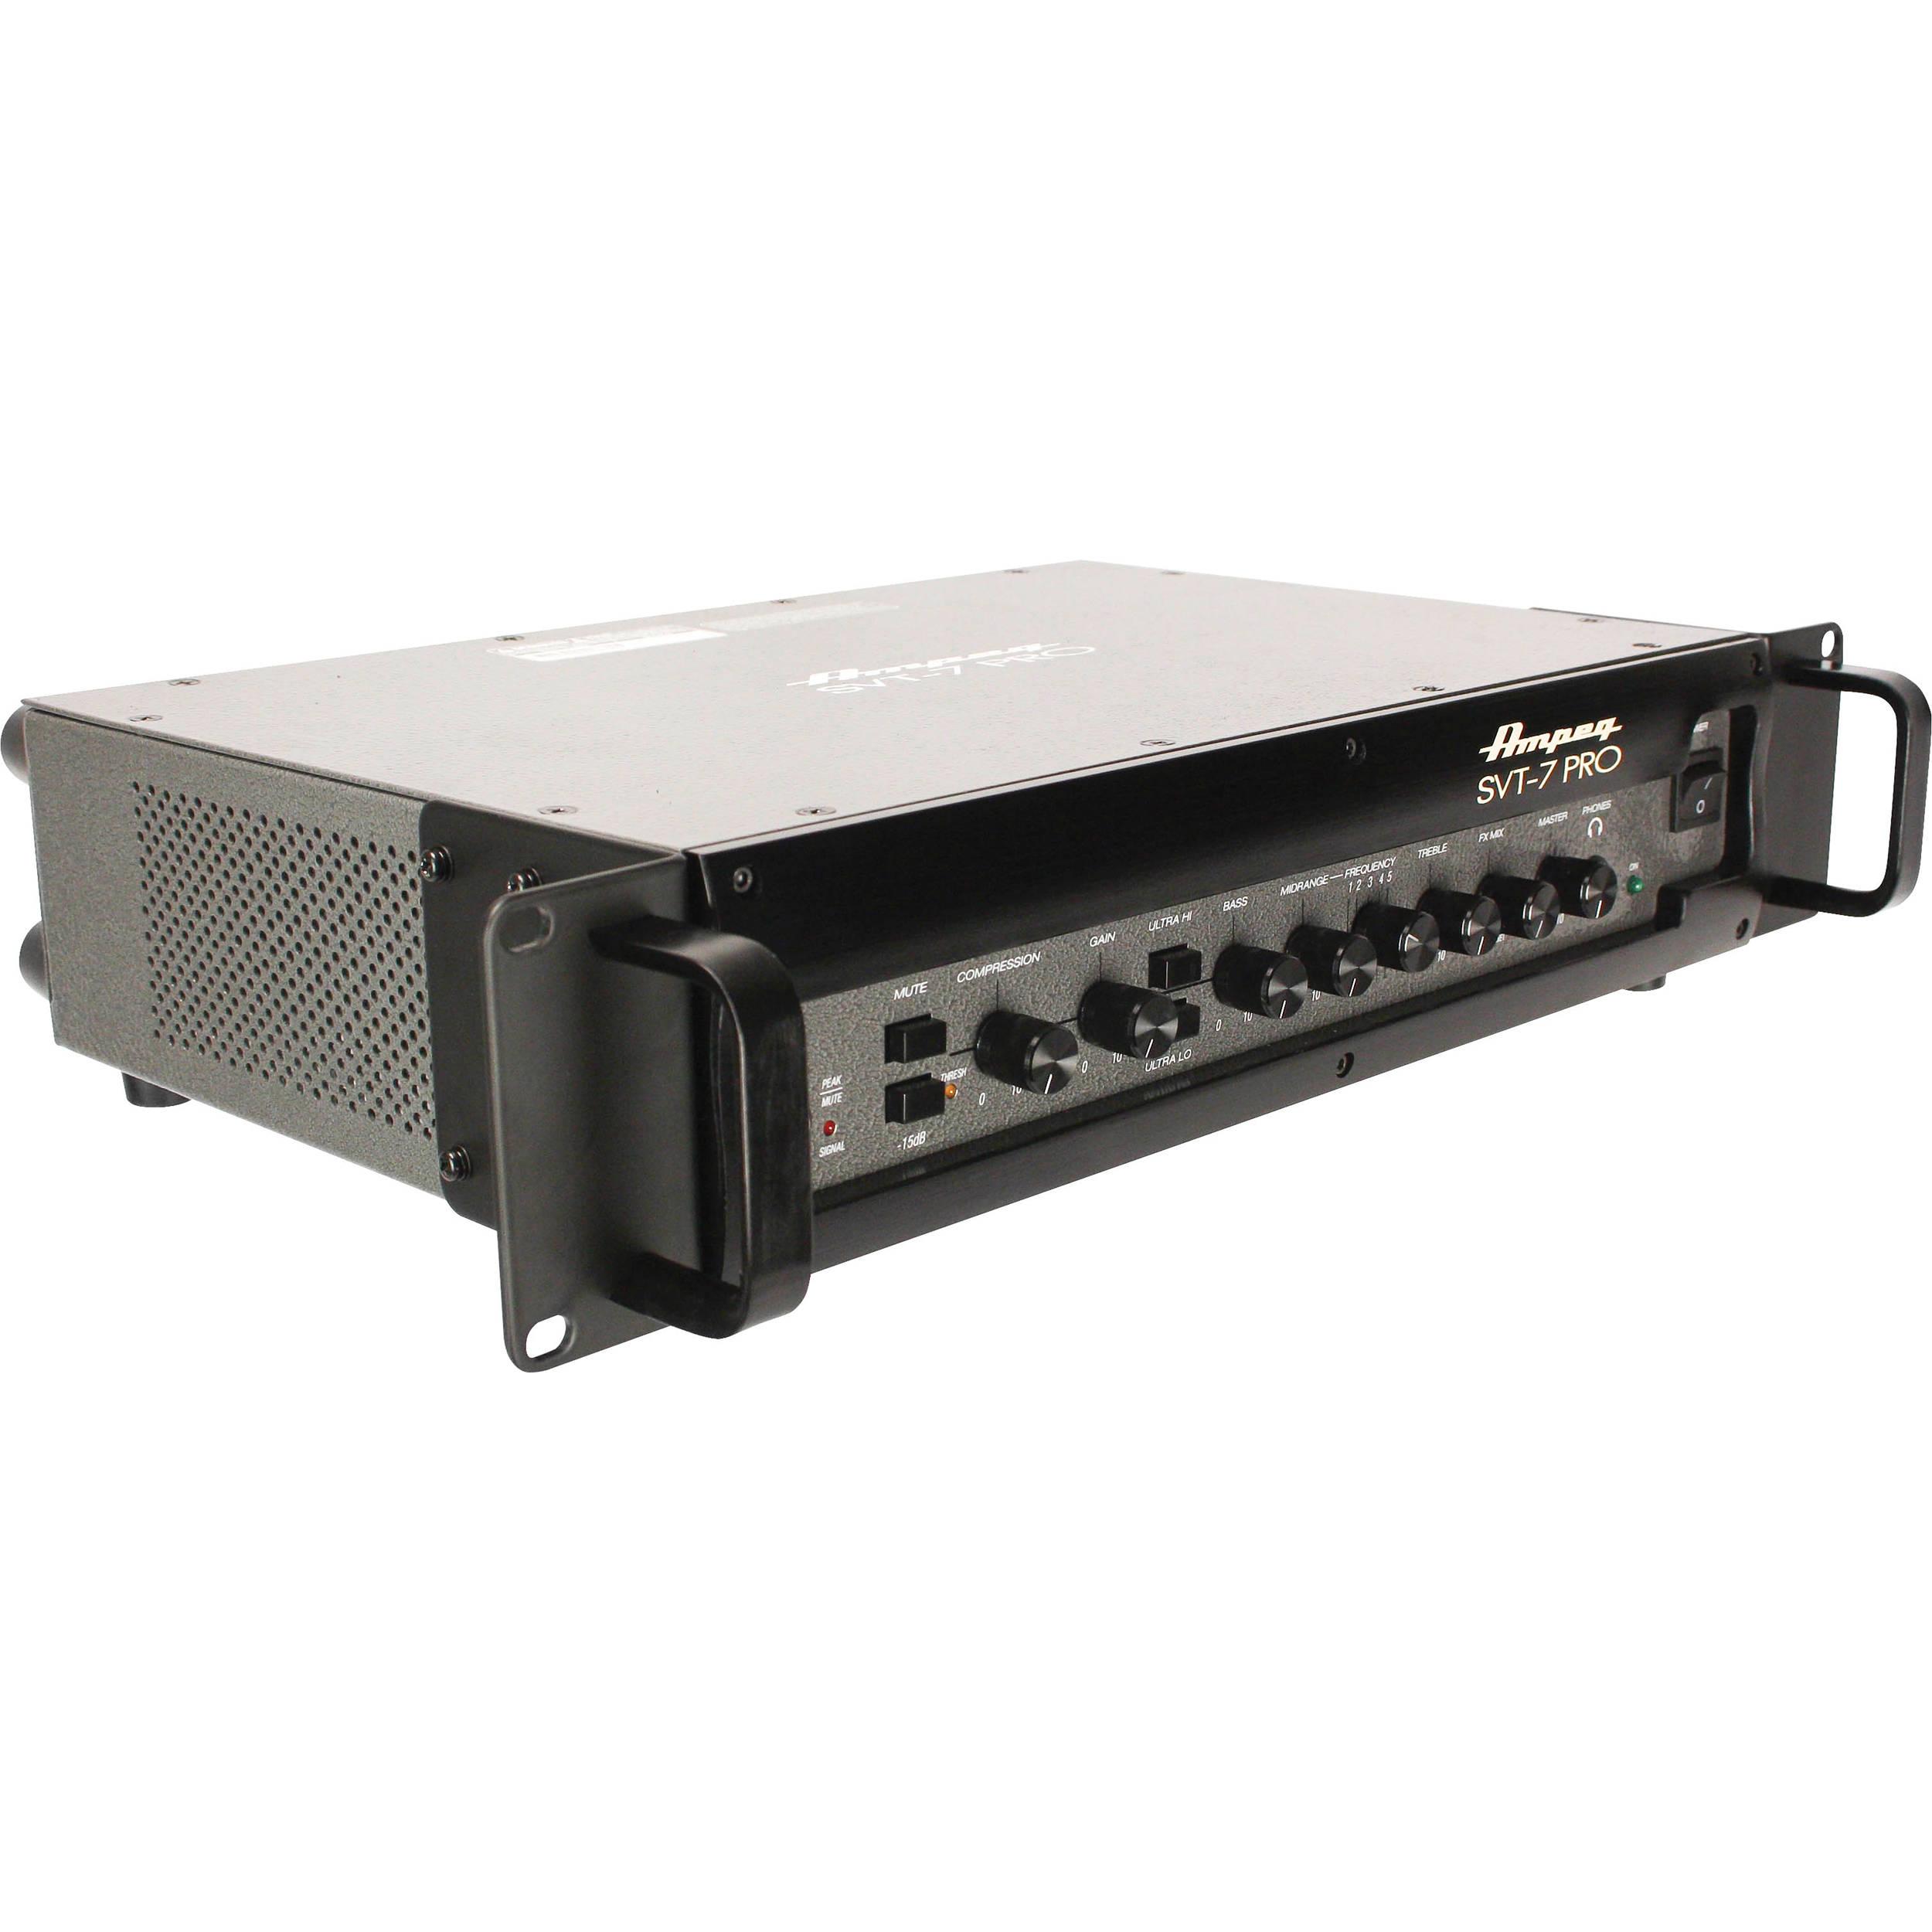 Ampeg SVT Pro 1000W HeadTube P